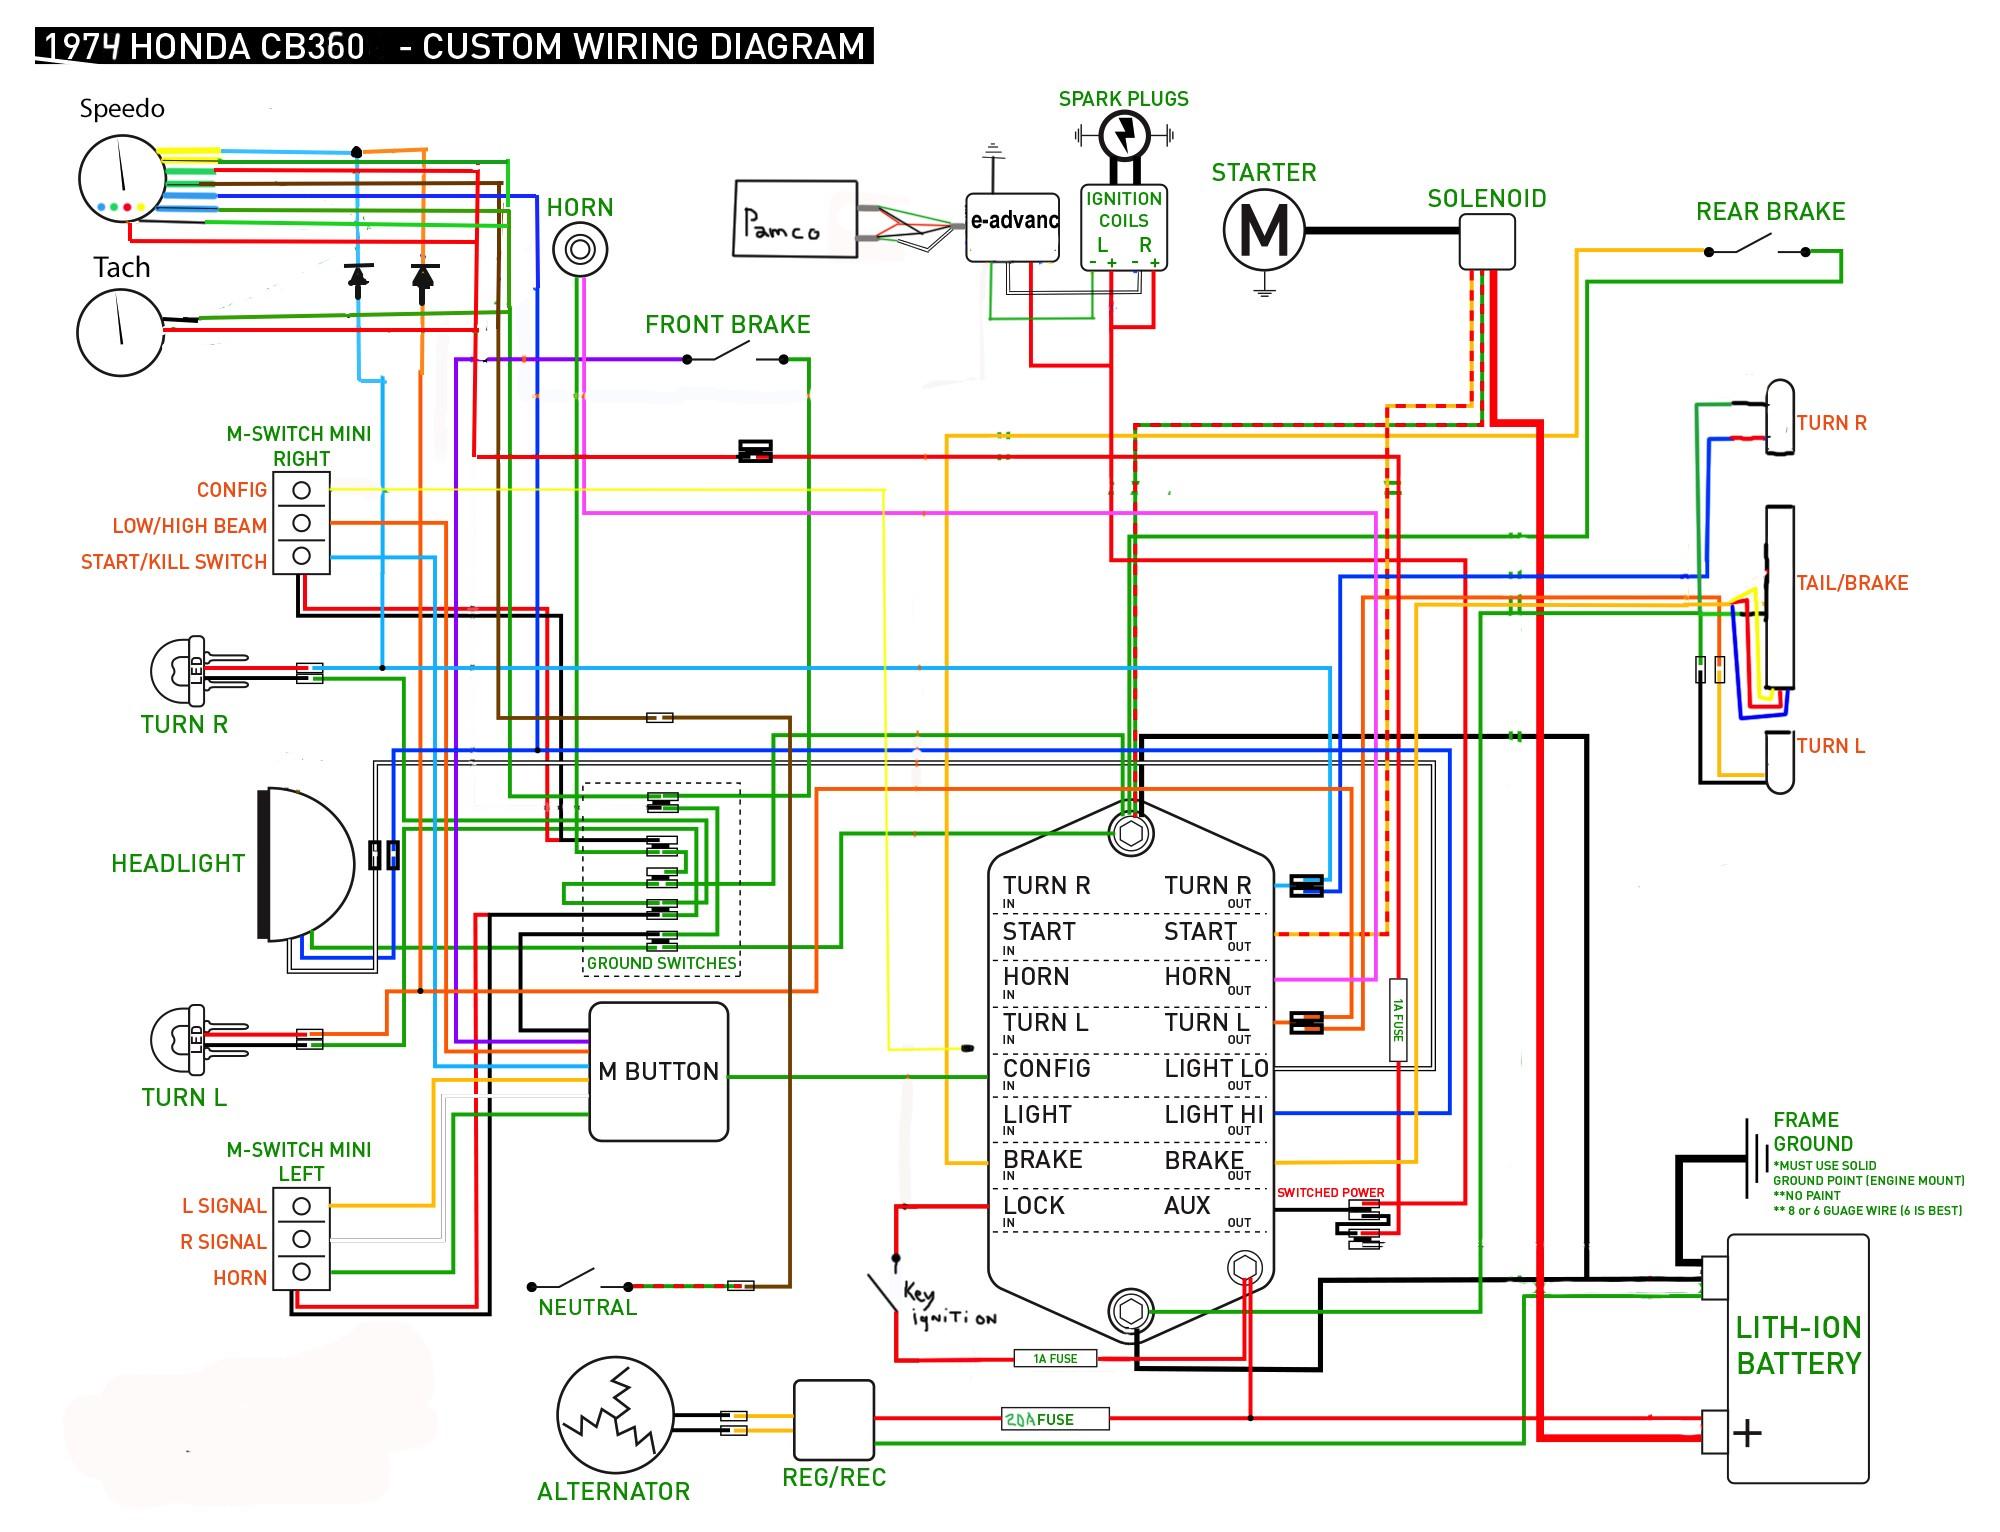 Viper 5301 Remote Starter Honda Ruckus Wiring Diagram